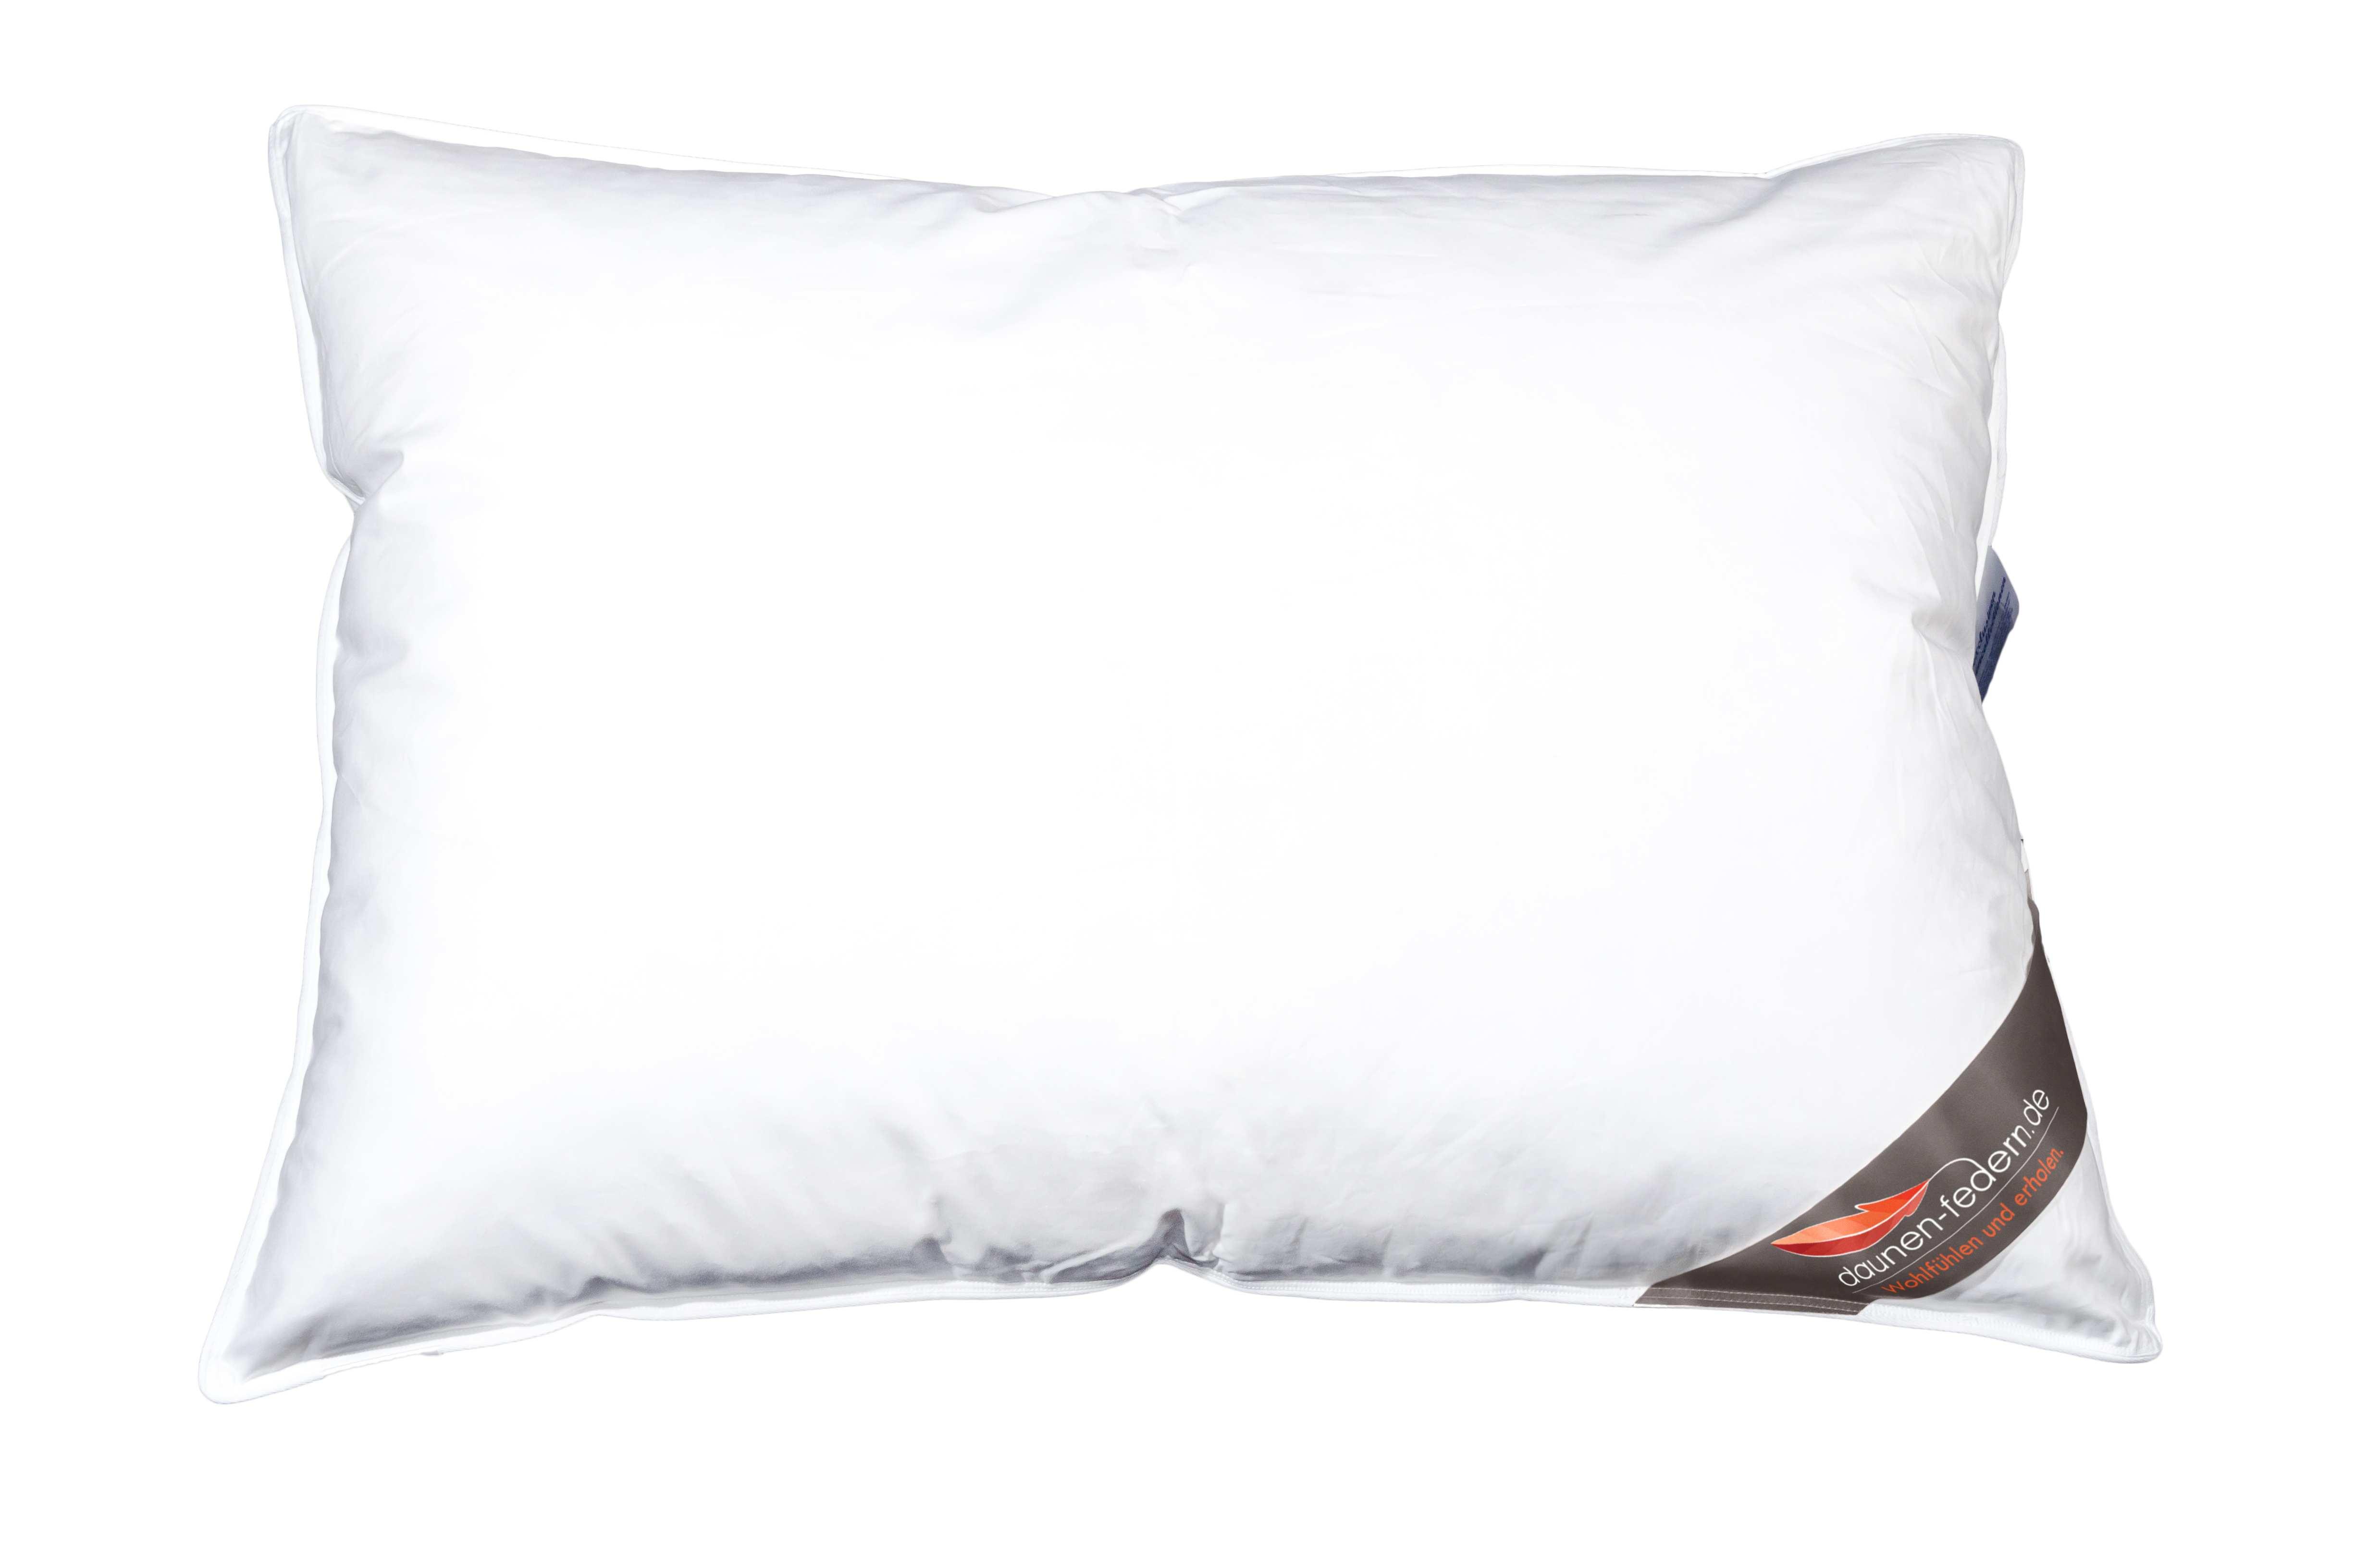 daunenkissen federkissen kopfkissen 60x80 100 federn. Black Bedroom Furniture Sets. Home Design Ideas